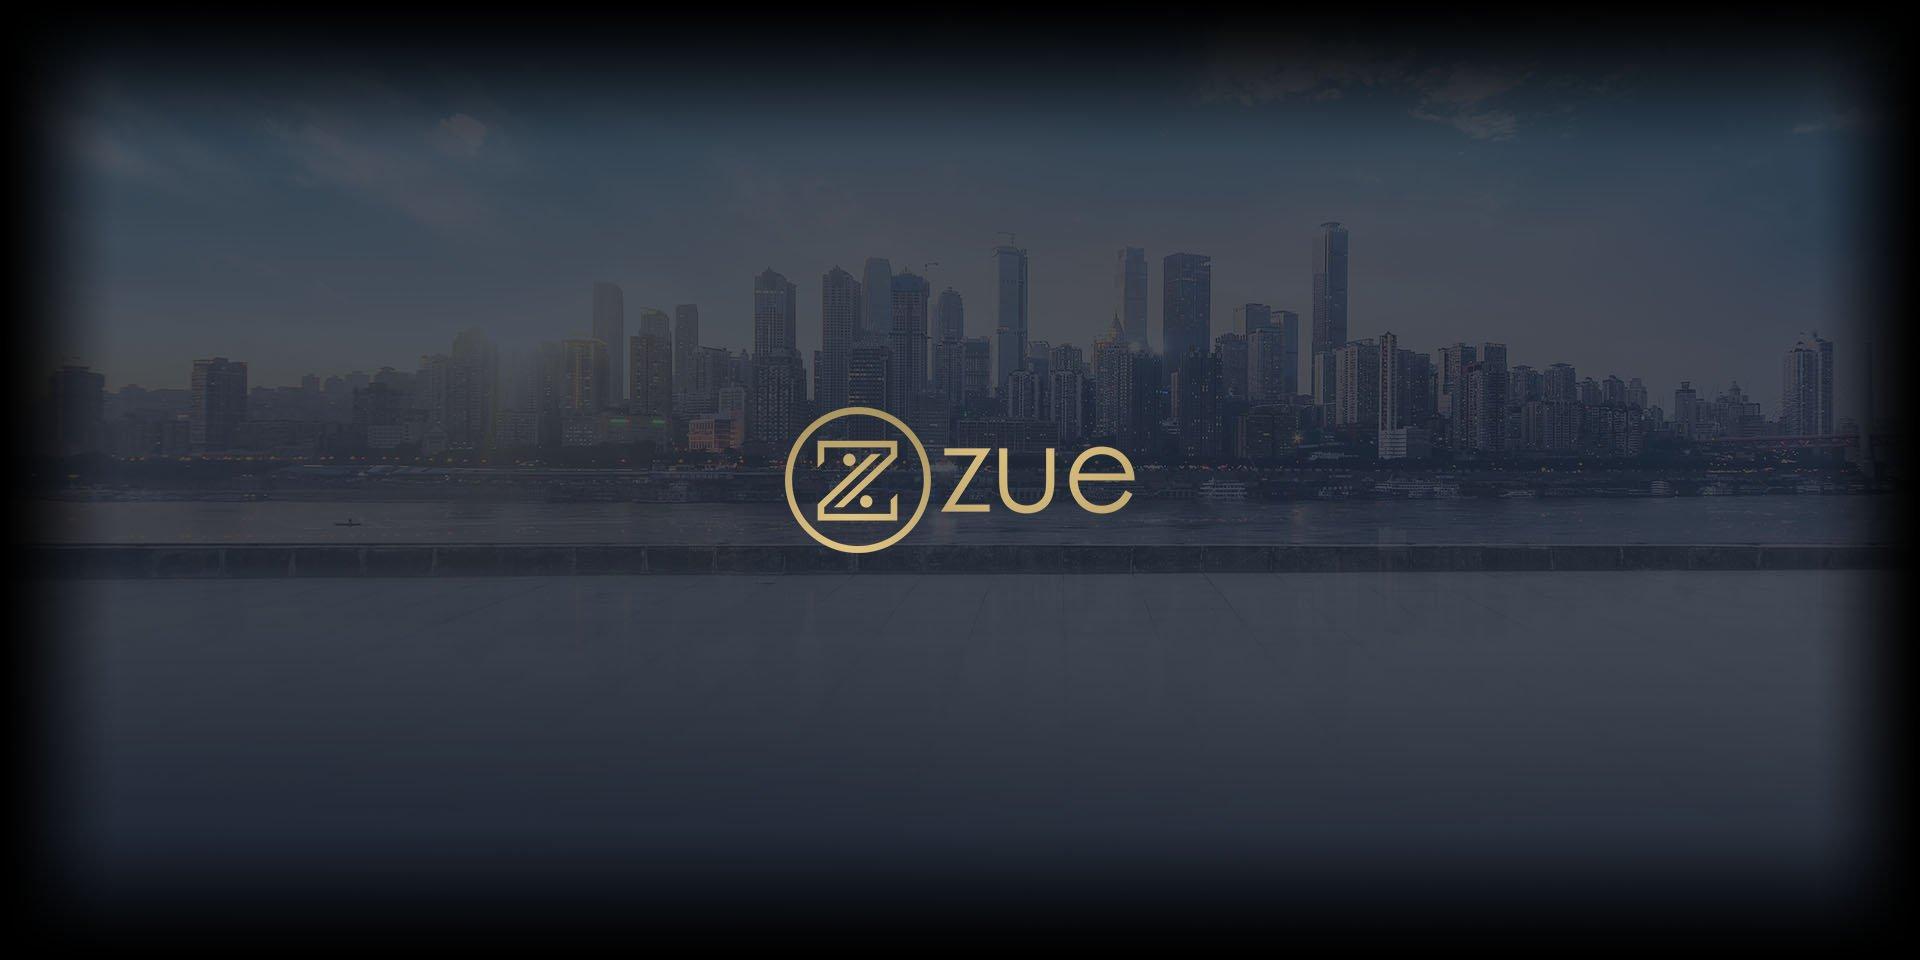 ZUEN Chain Launches ICO Backed By World's First TotalWellness Blockchain Alliance Platform